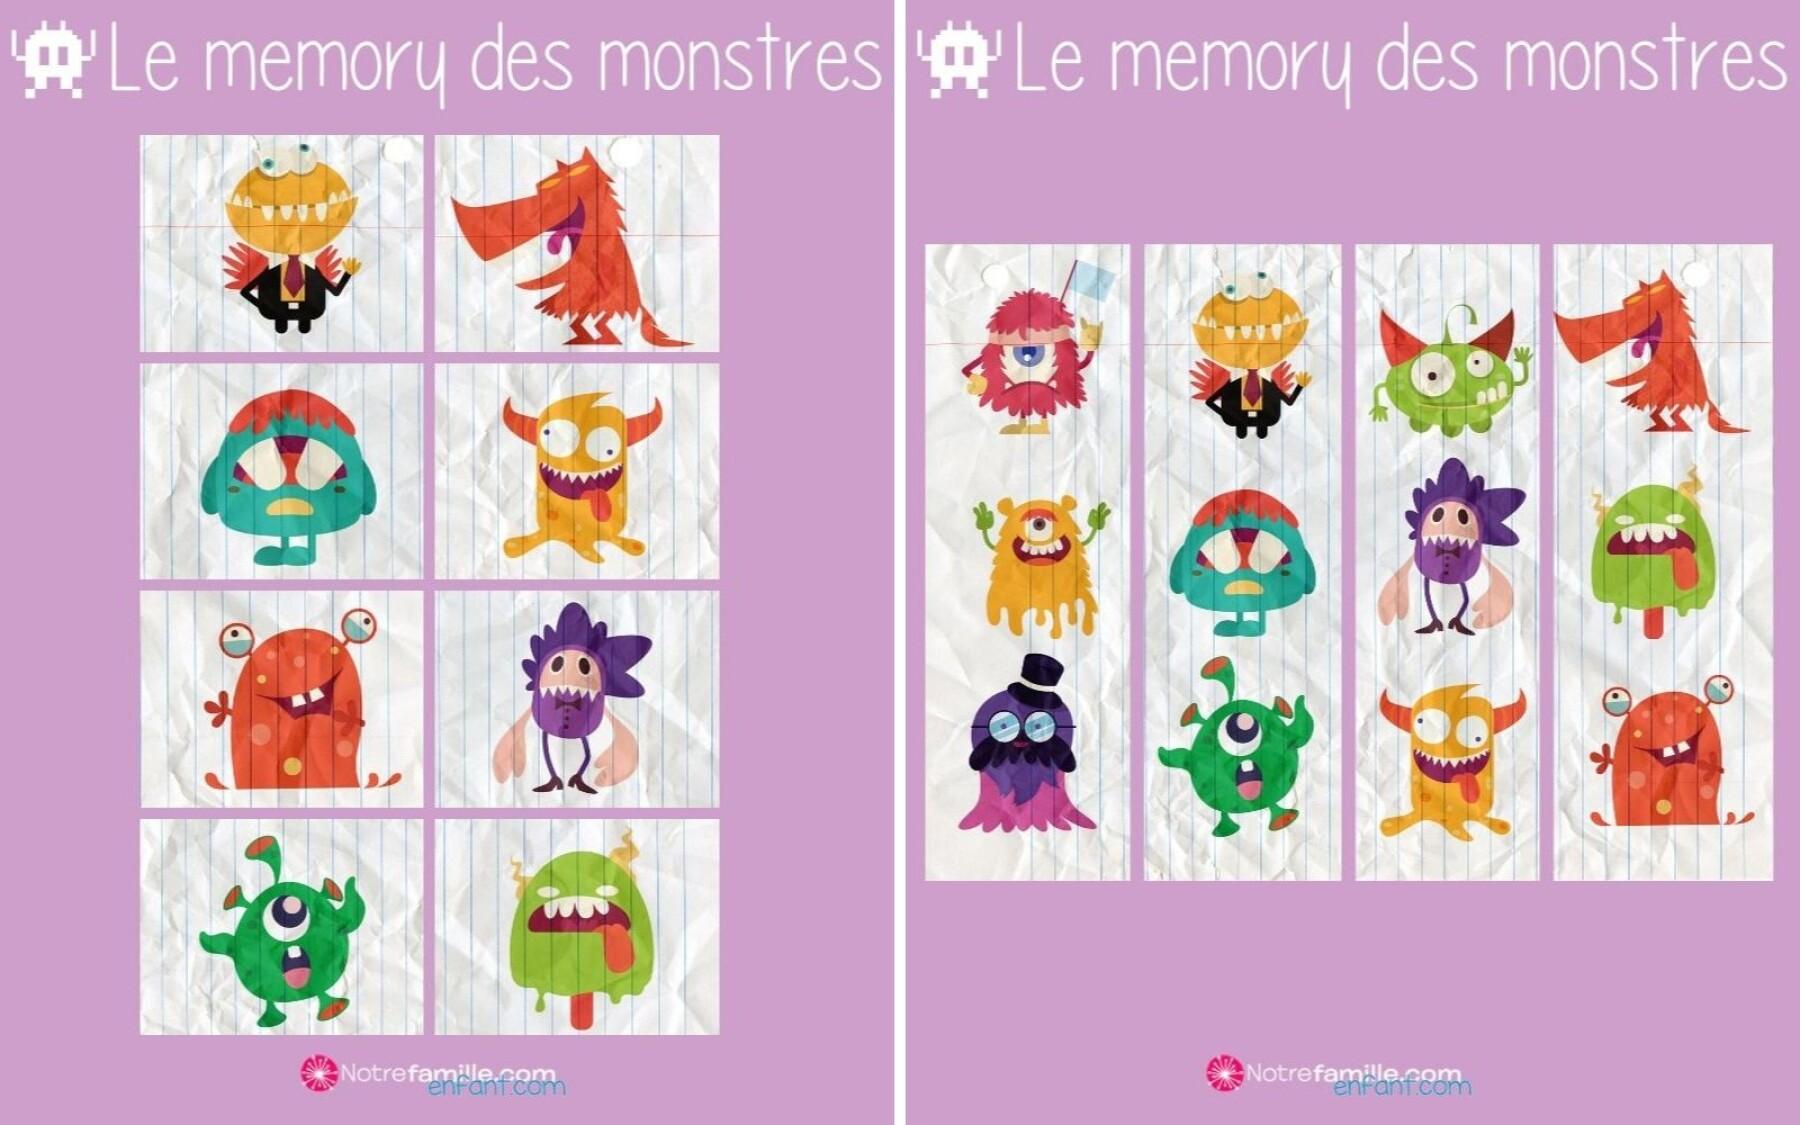 Memory des monstres